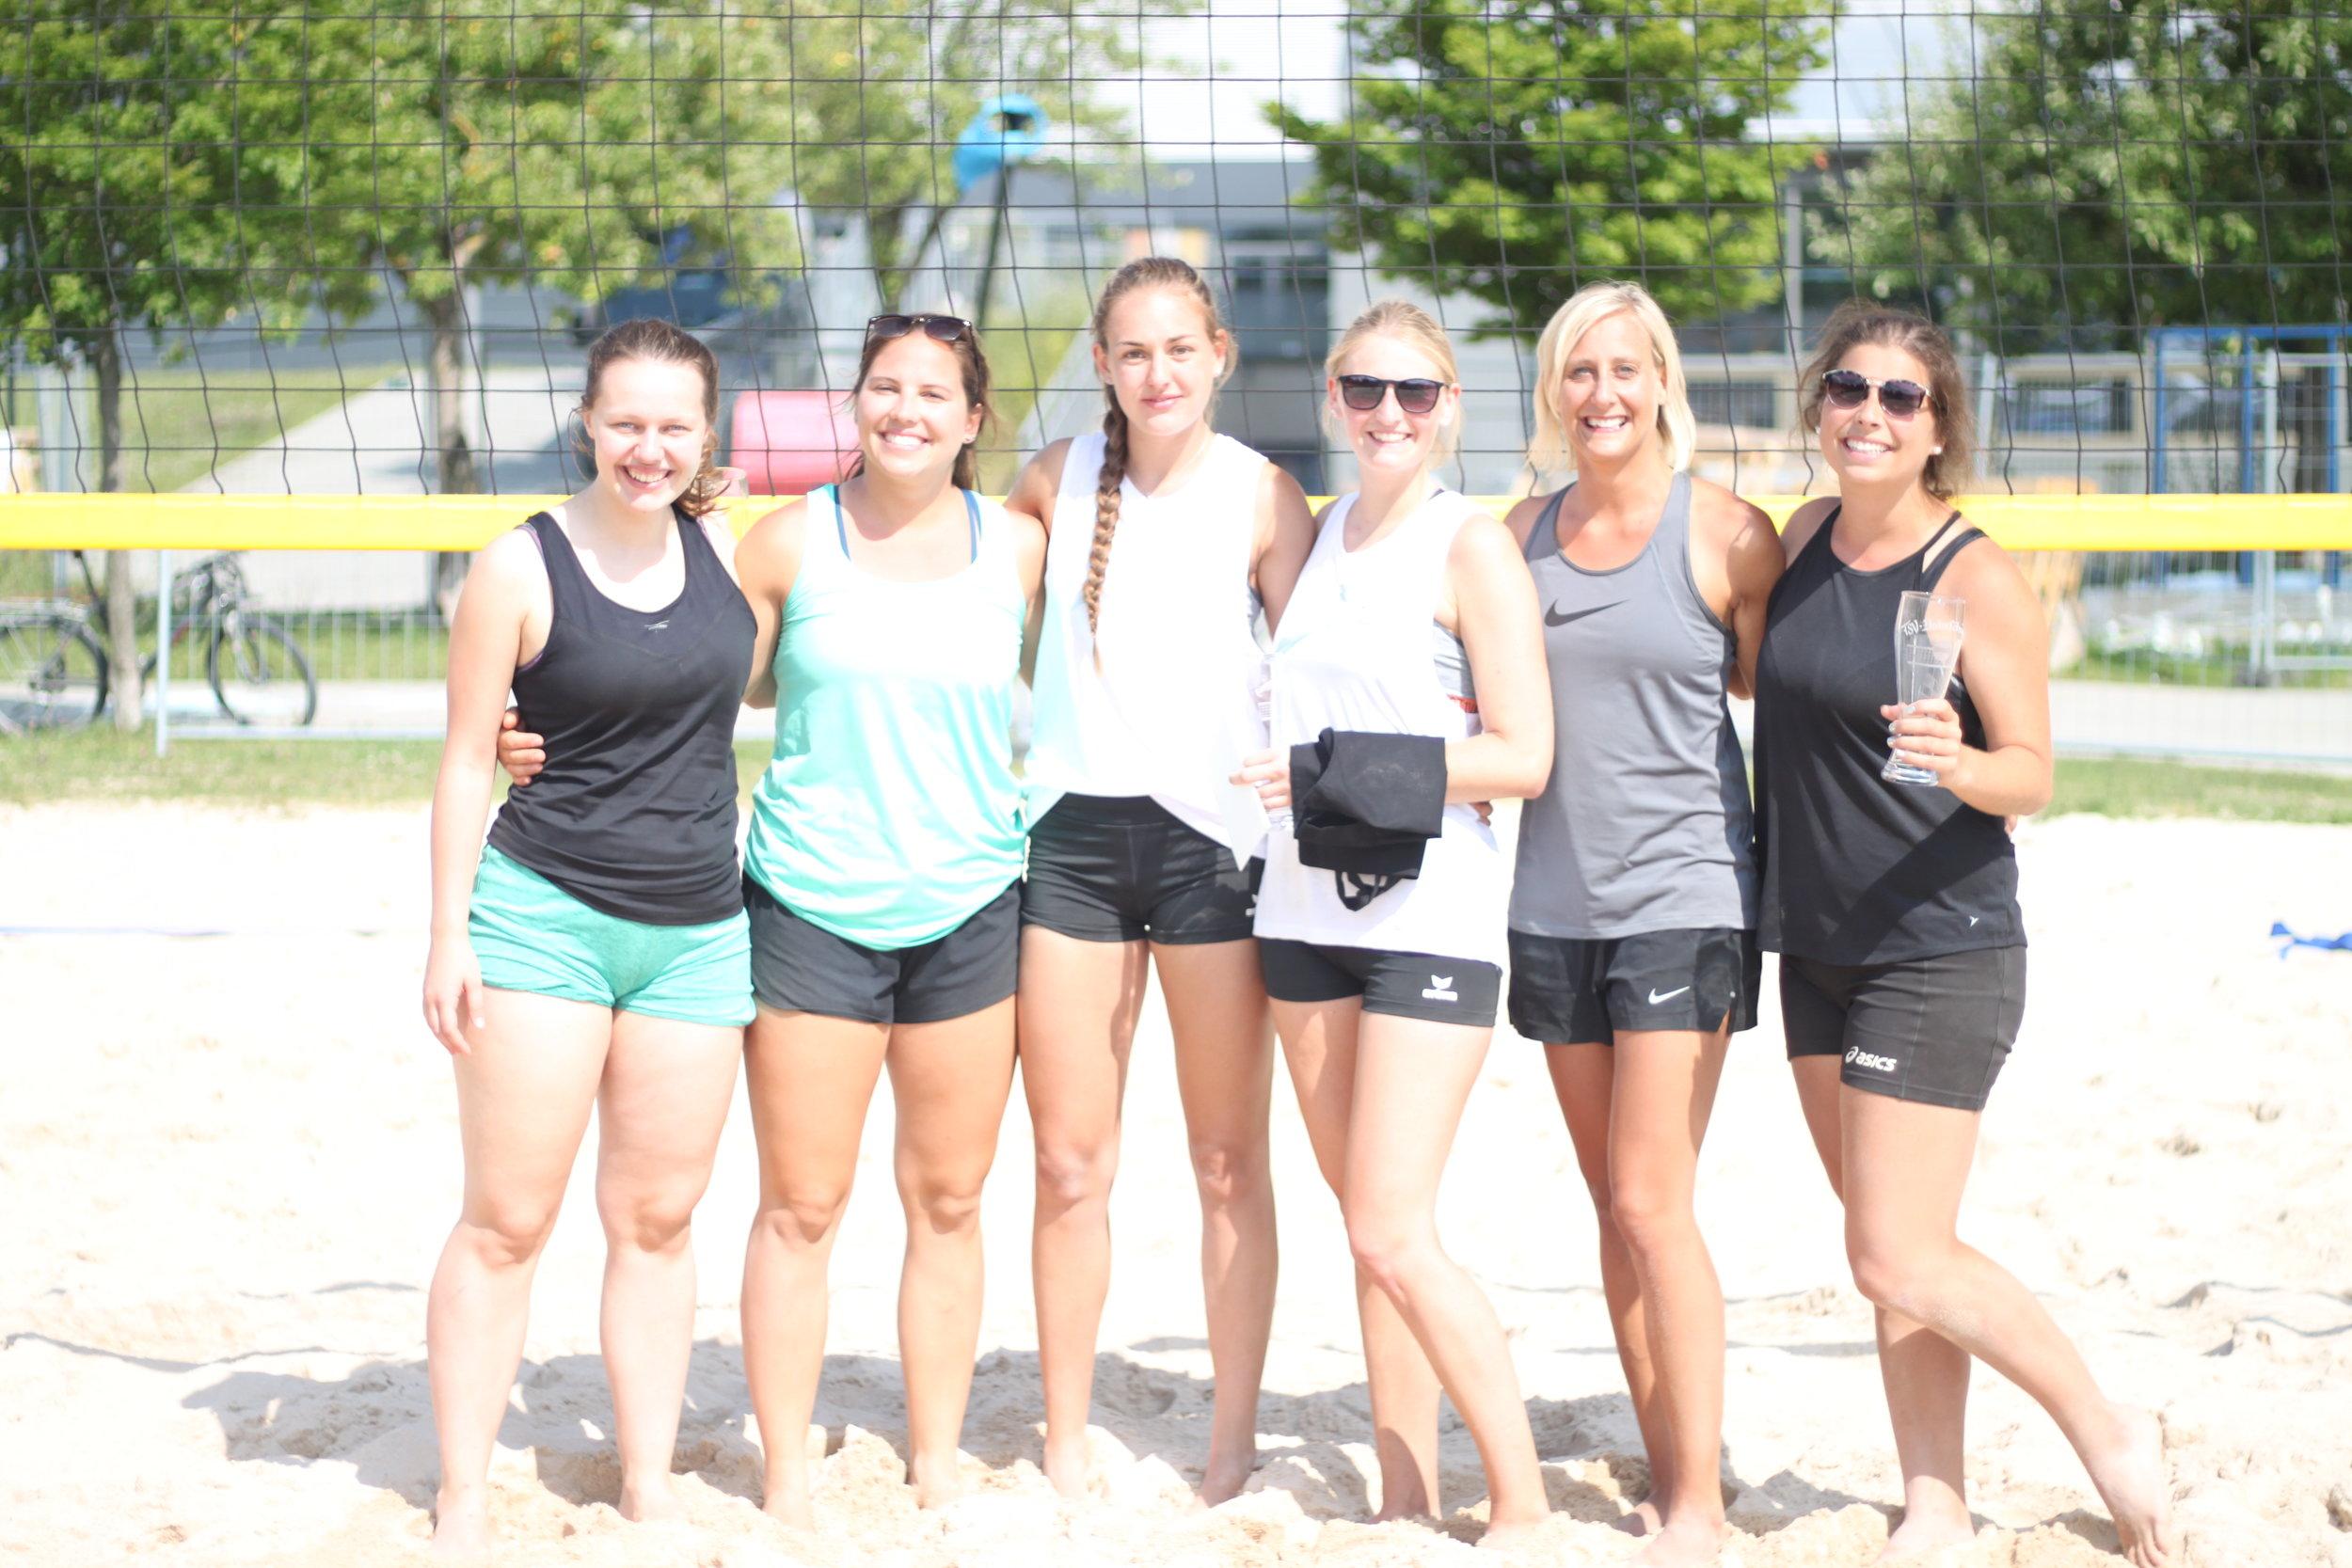 Die Siegerinnen von links:  Lea Strecker/Theresa Noack (Platz 2), Melinda Drechsel/Andrea Marschall (Platz 1), Jana Uhl/Ann-Kathrin Servatius (Platz 3)